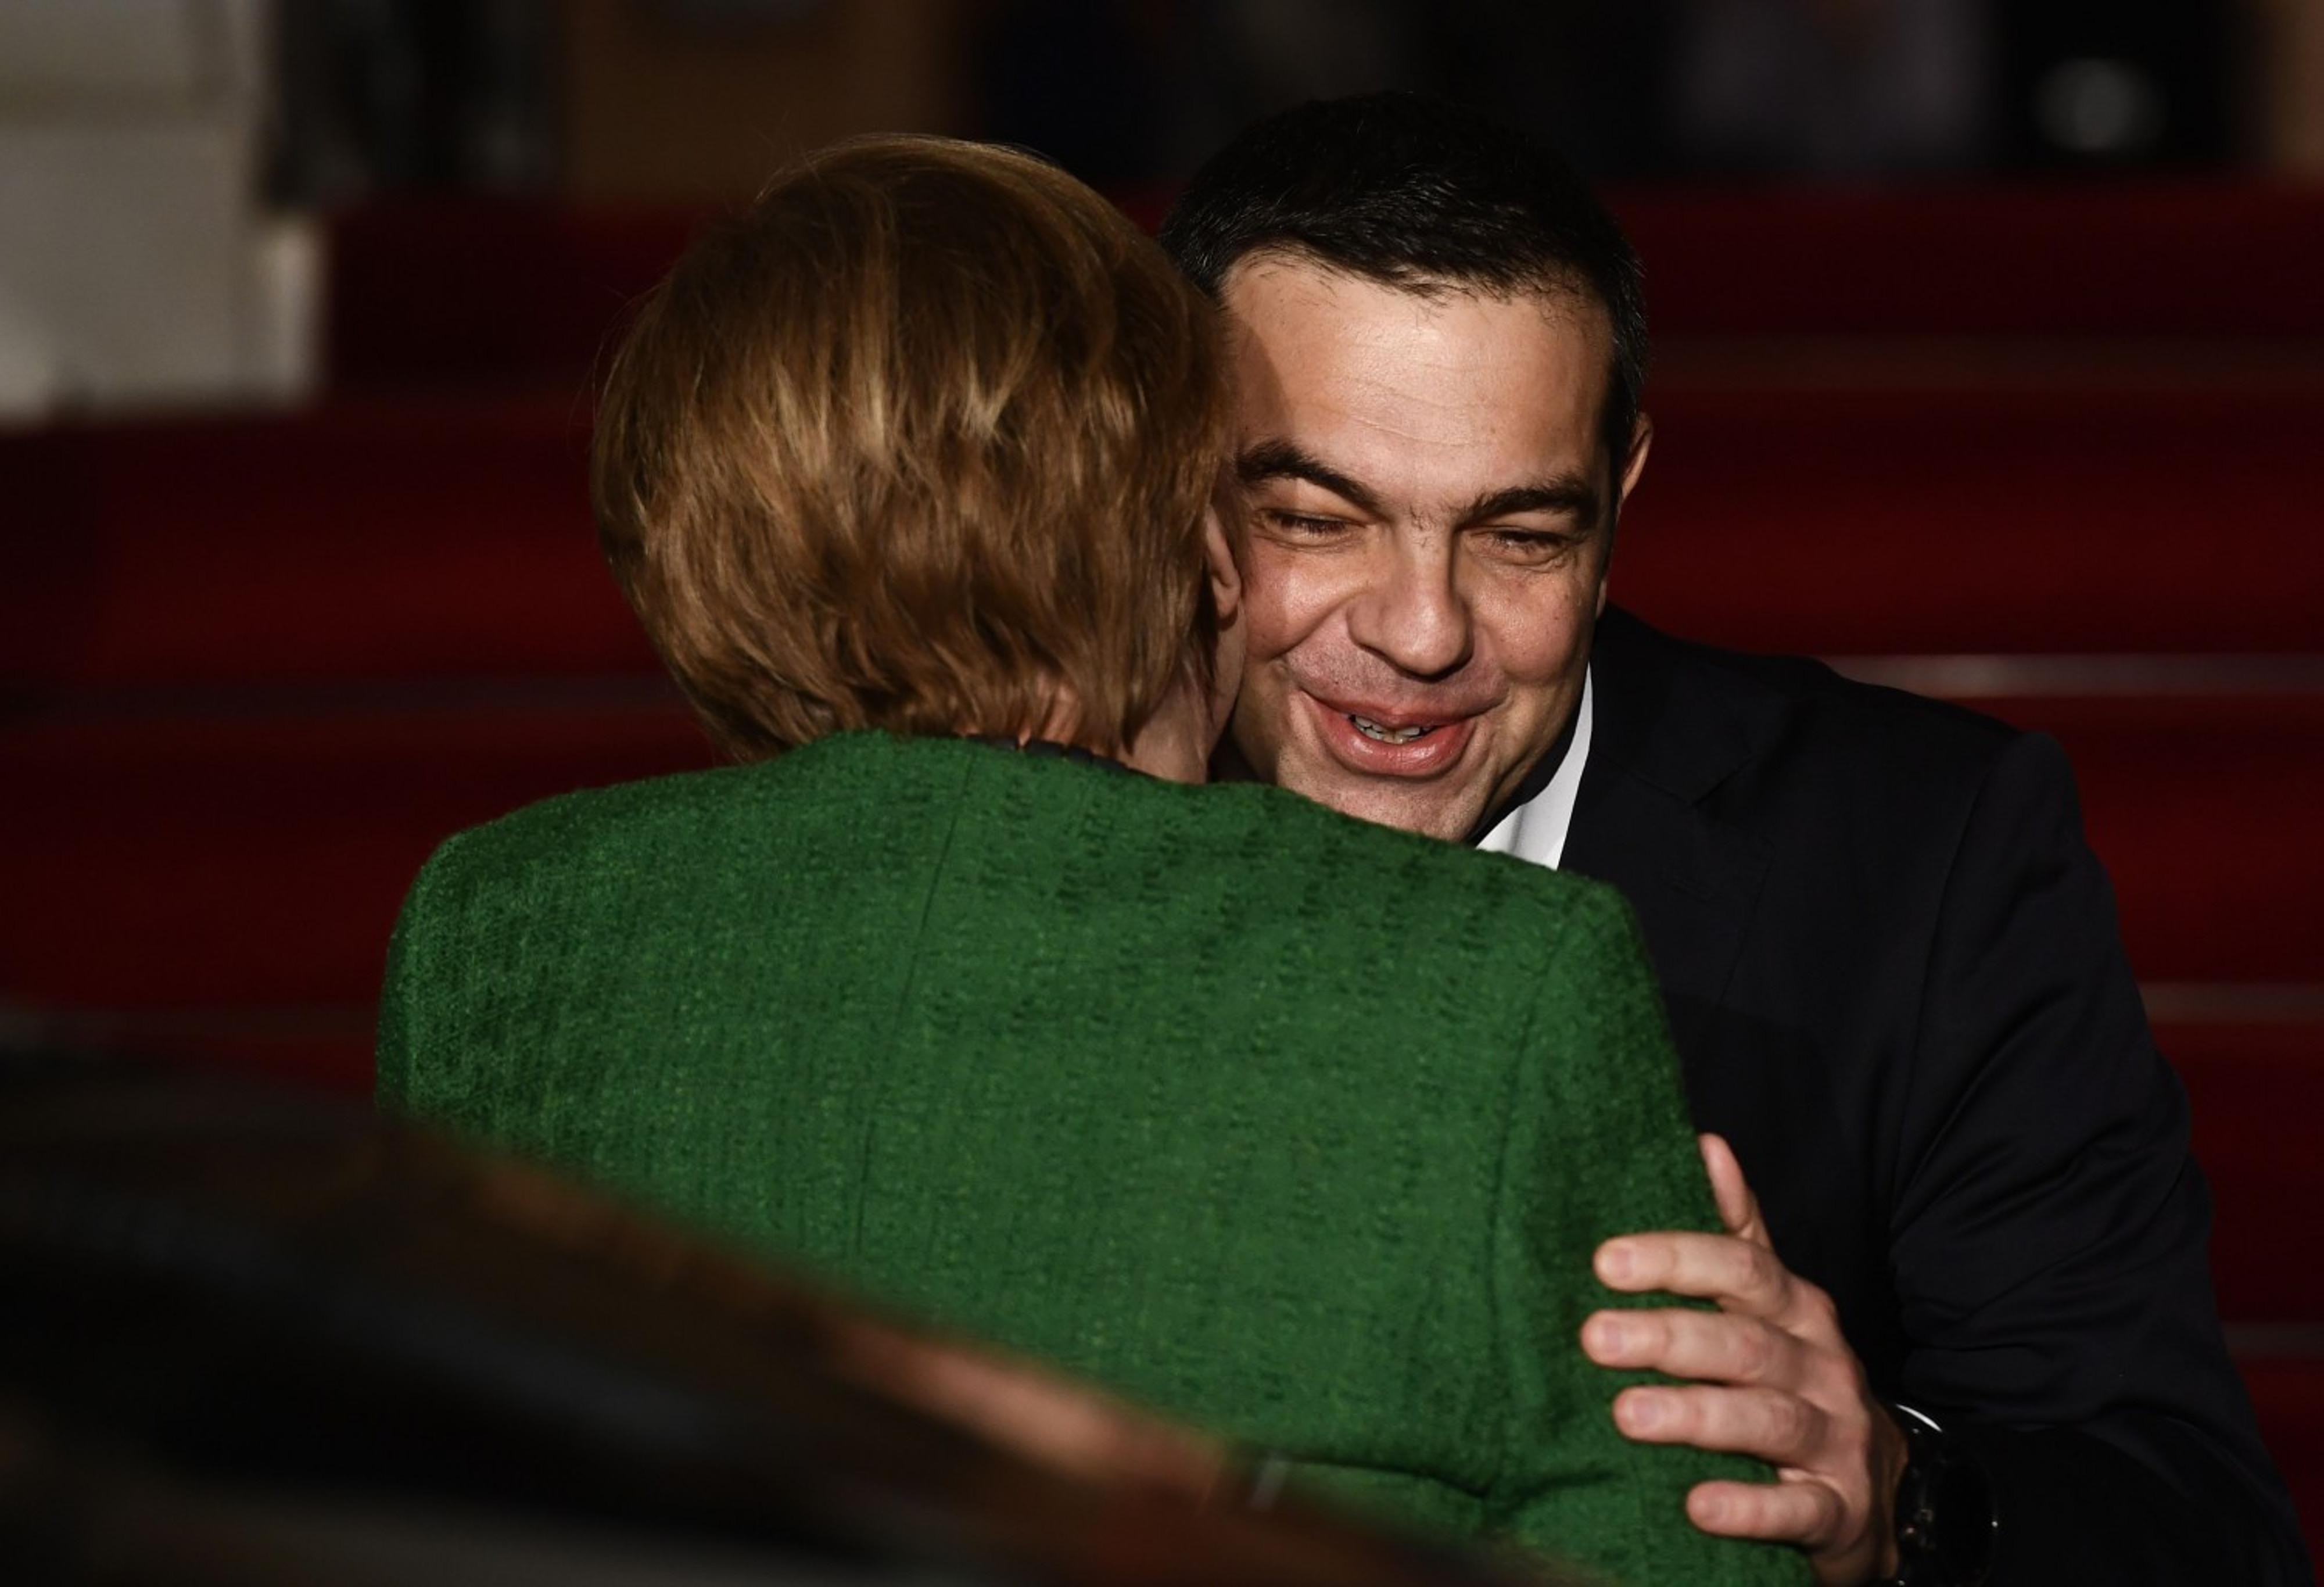 Tsipras si inchina alla Merkel. Così Atene si è arresa a Berlino